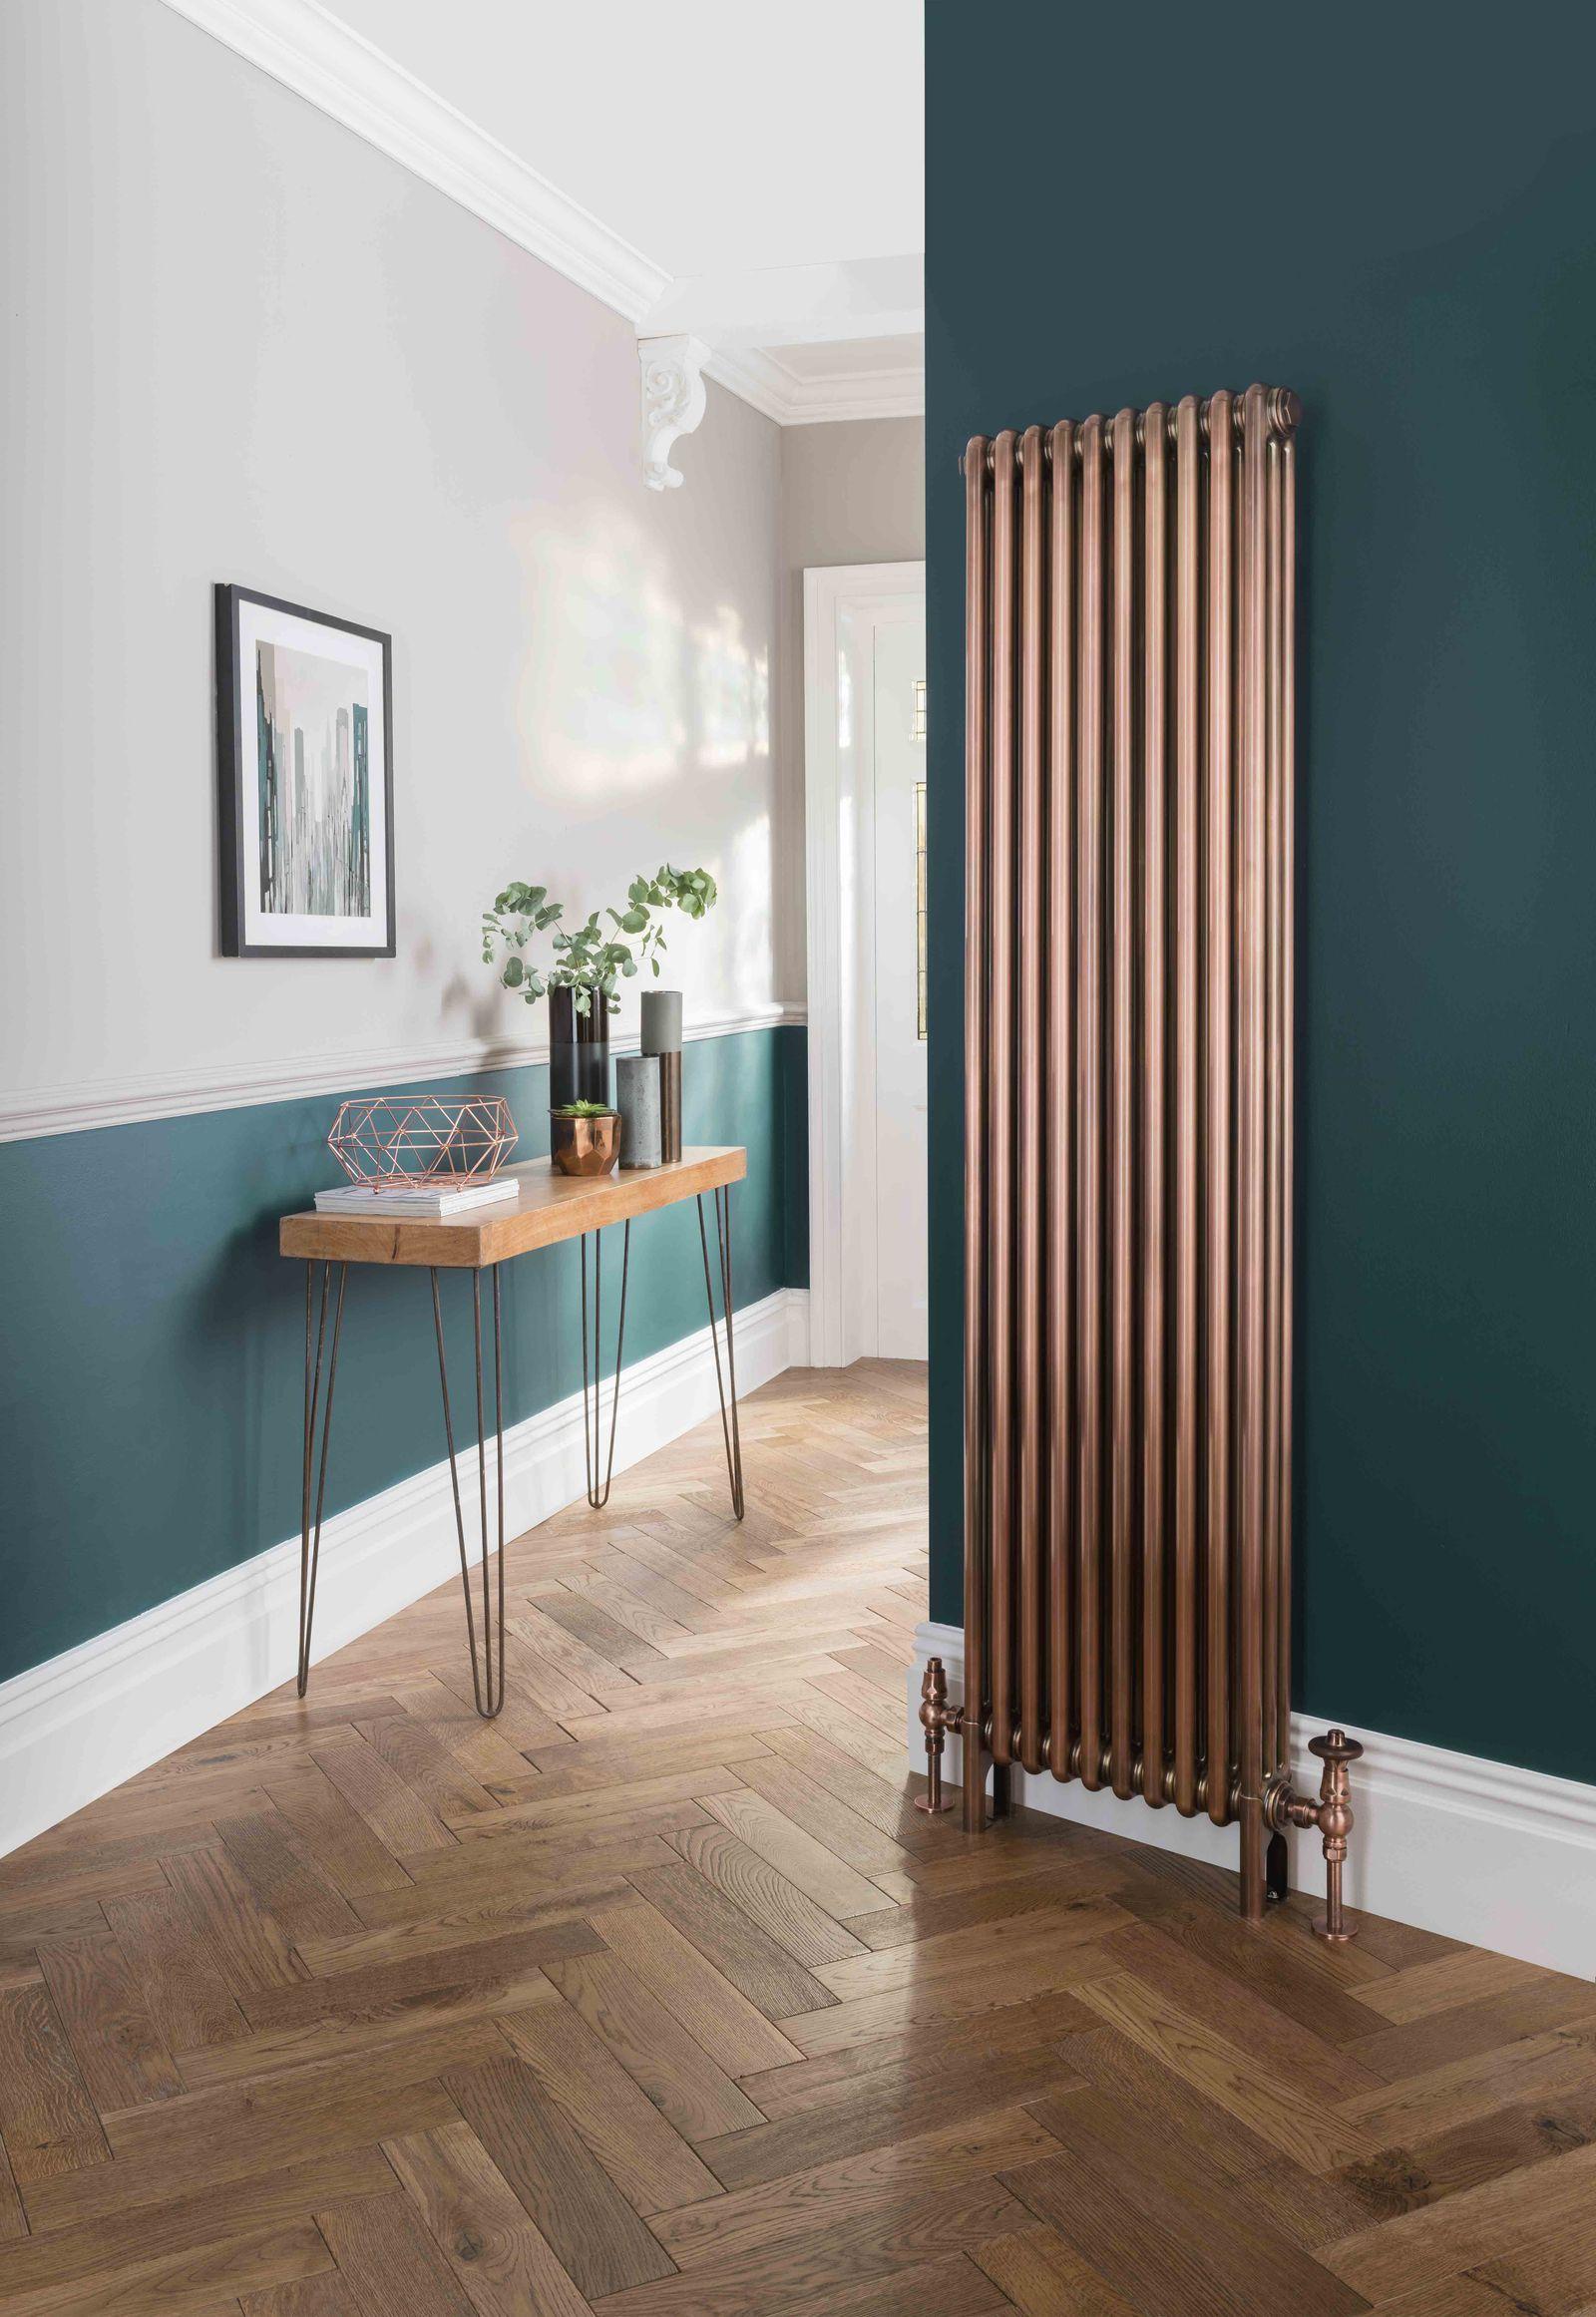 18 really useful hallway decorating ideas from interior designers rh pinterest com